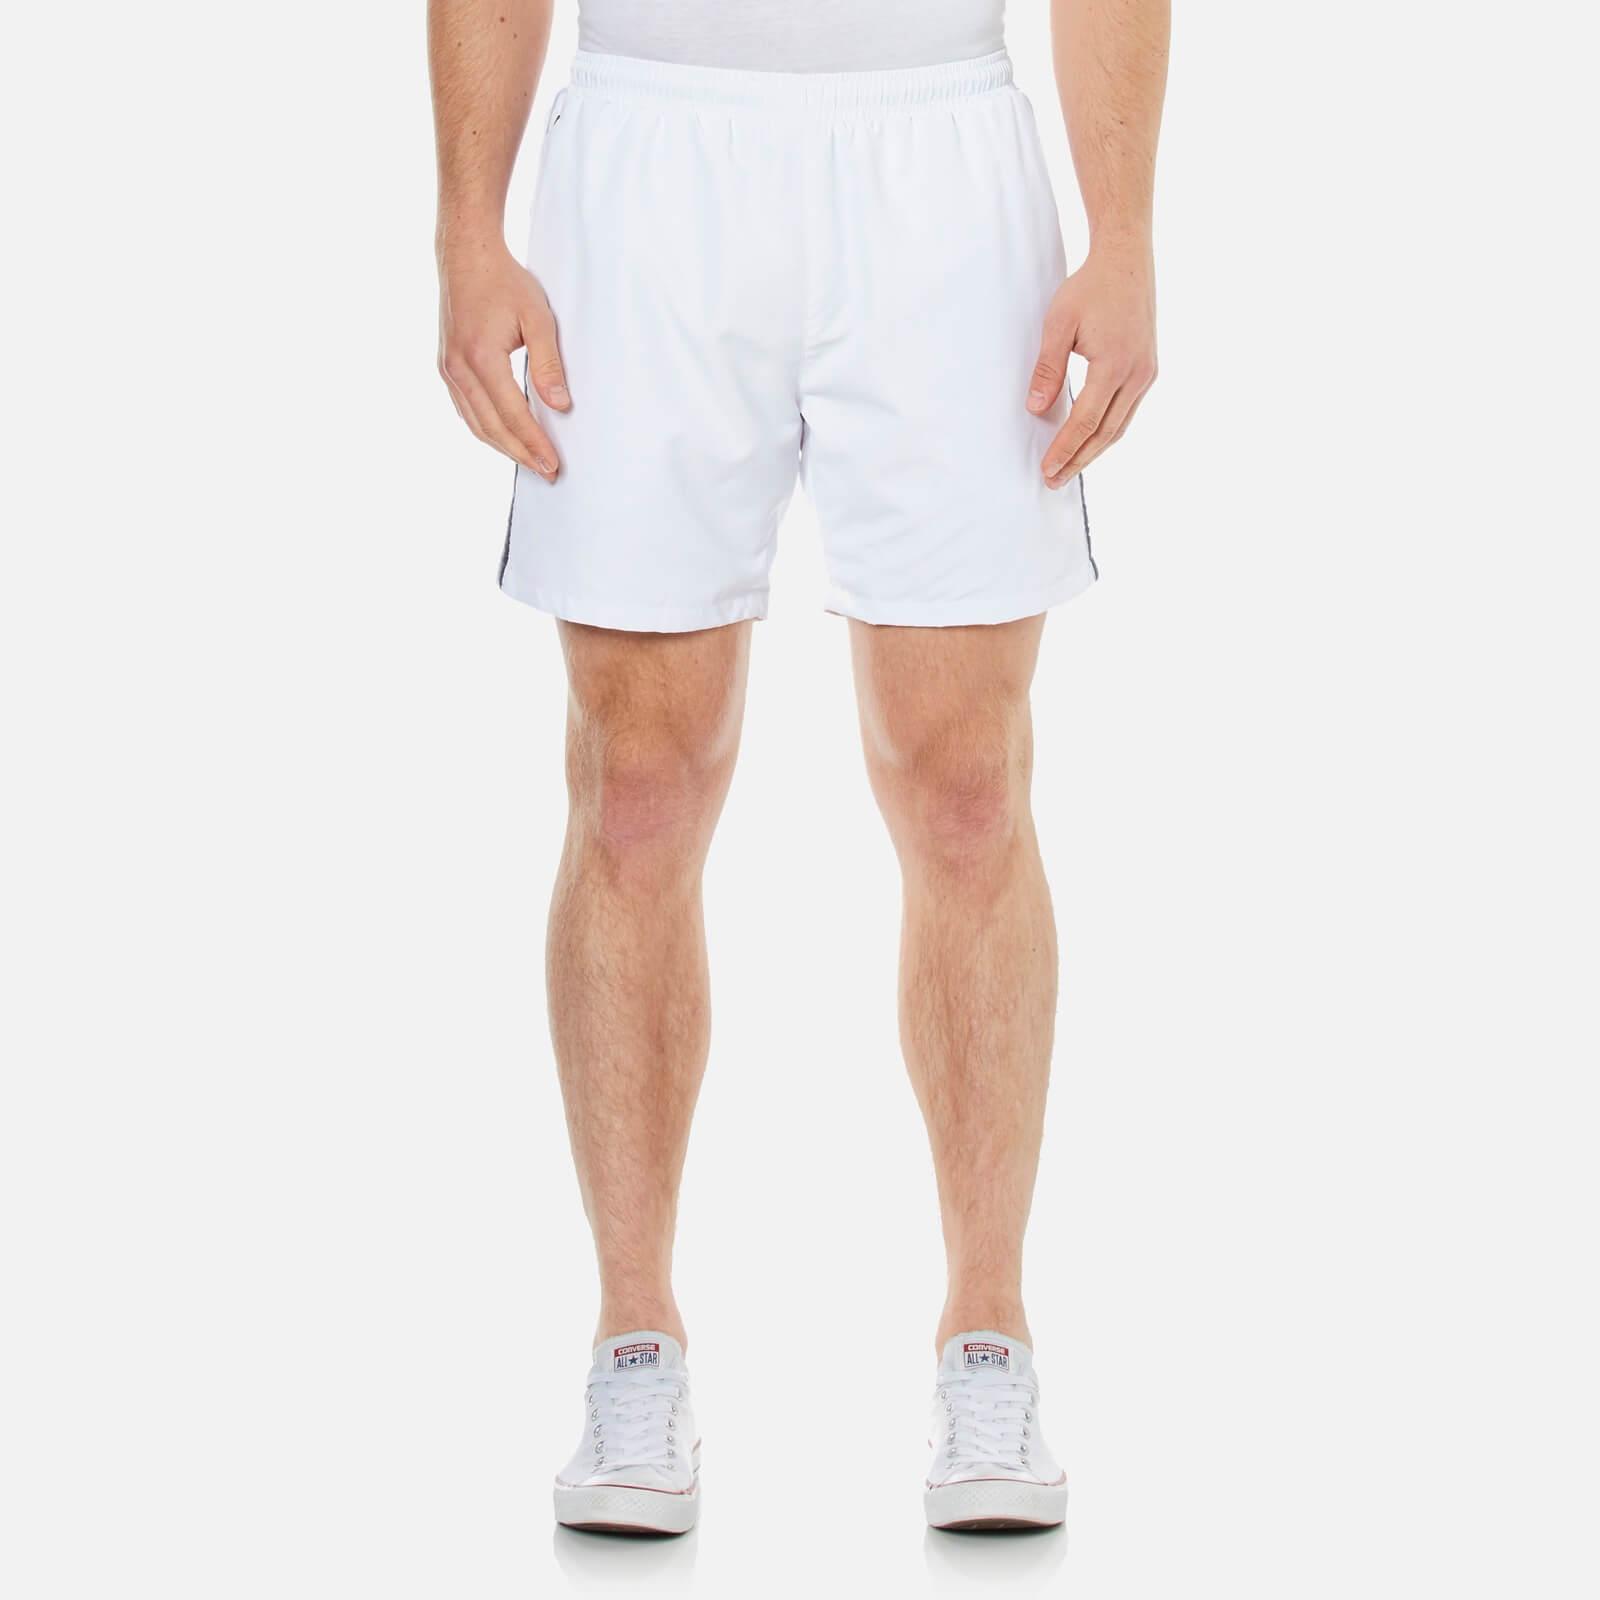 f0f3fa31926e0 BOSS Hugo Boss Men's Seabream Swim Shorts - White - Free UK Delivery over  £50